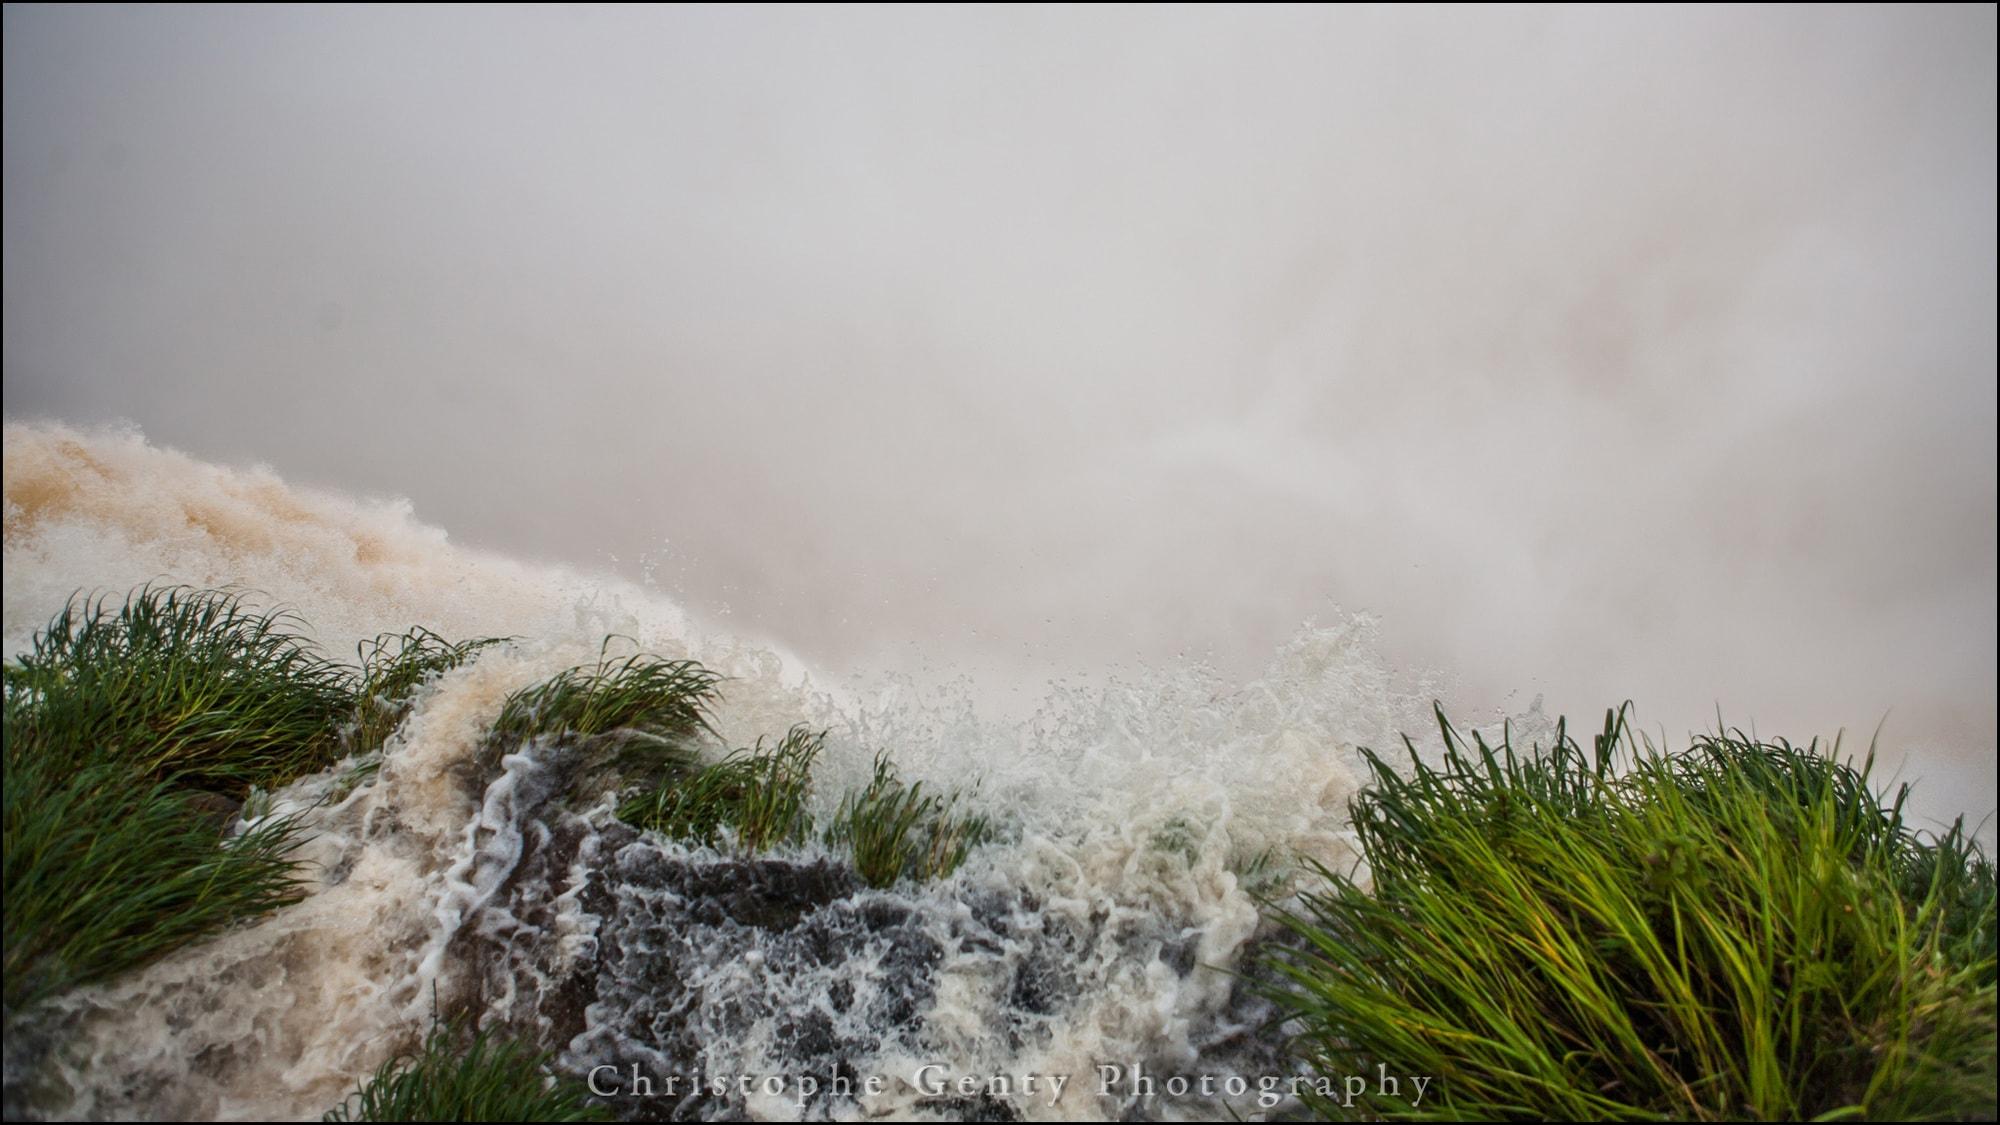 Devil's Throat, Iguazu Falls, Argentina - December 2015